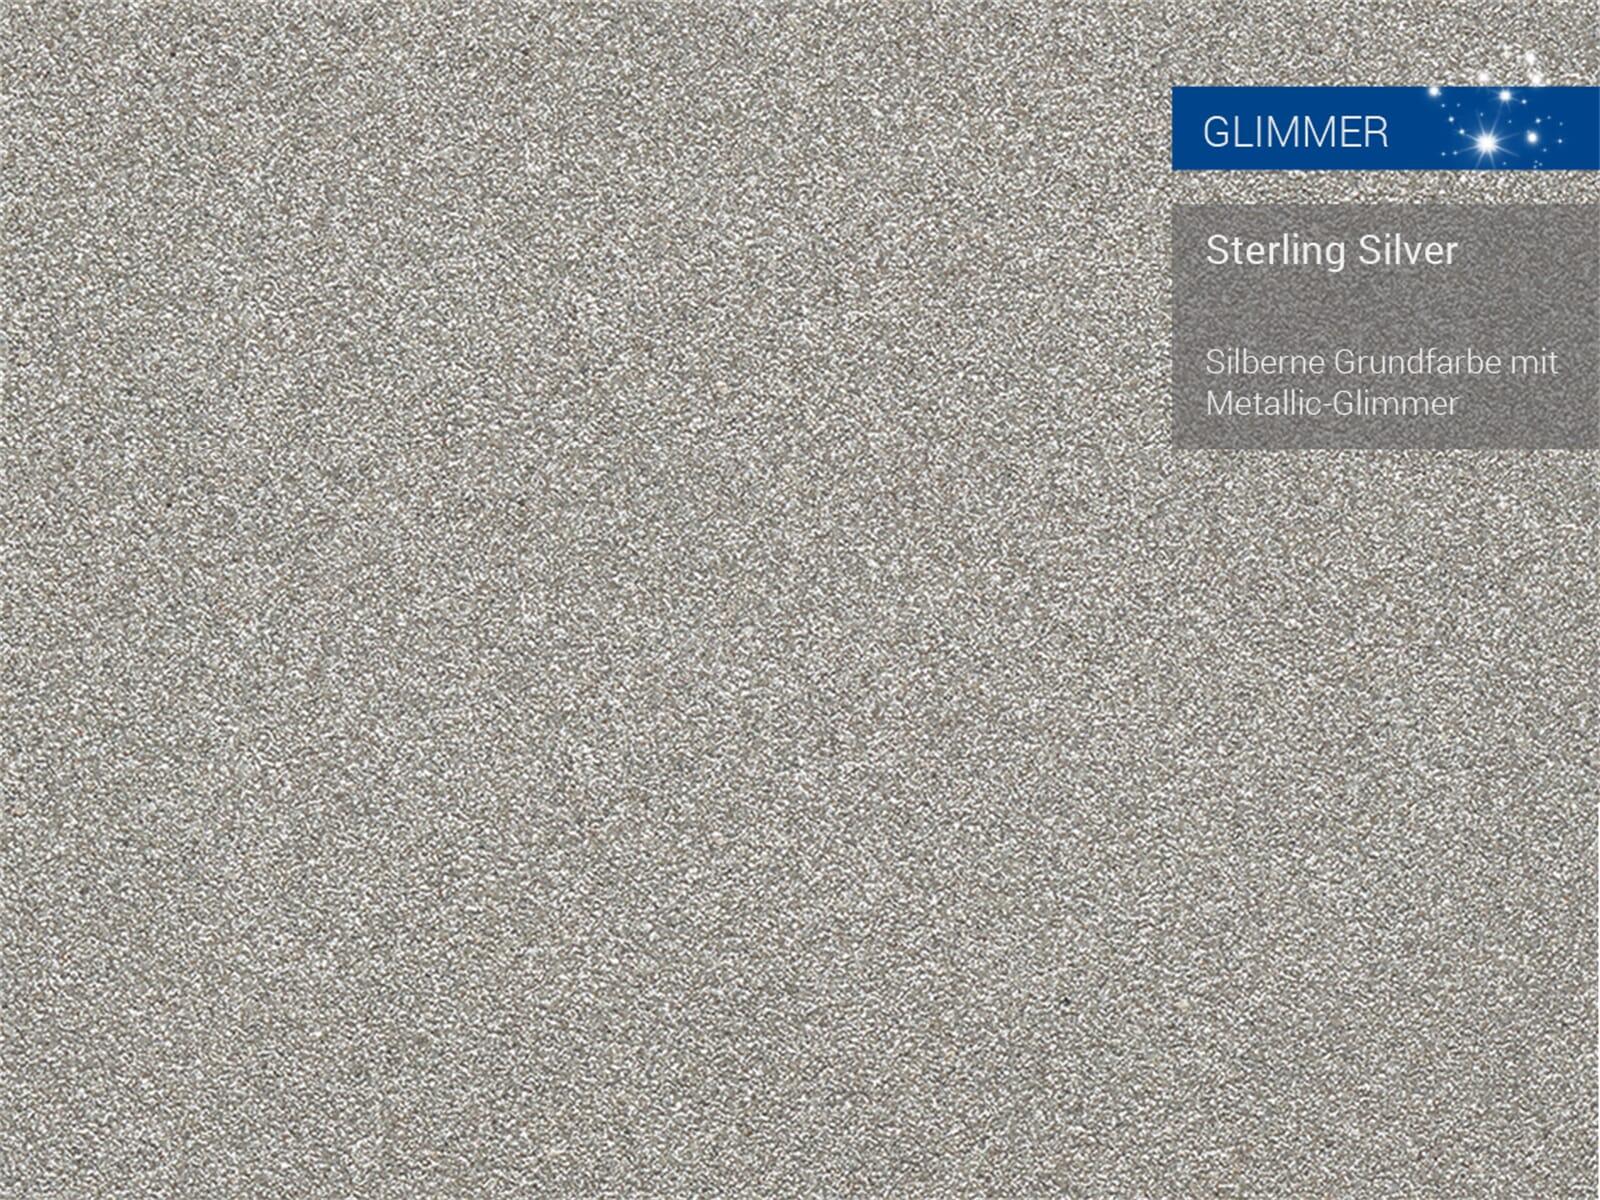 Franke Kubus 2 KNG 110-52 Sterling Silver - 11974 Granitspüle Exzenterbetätigung